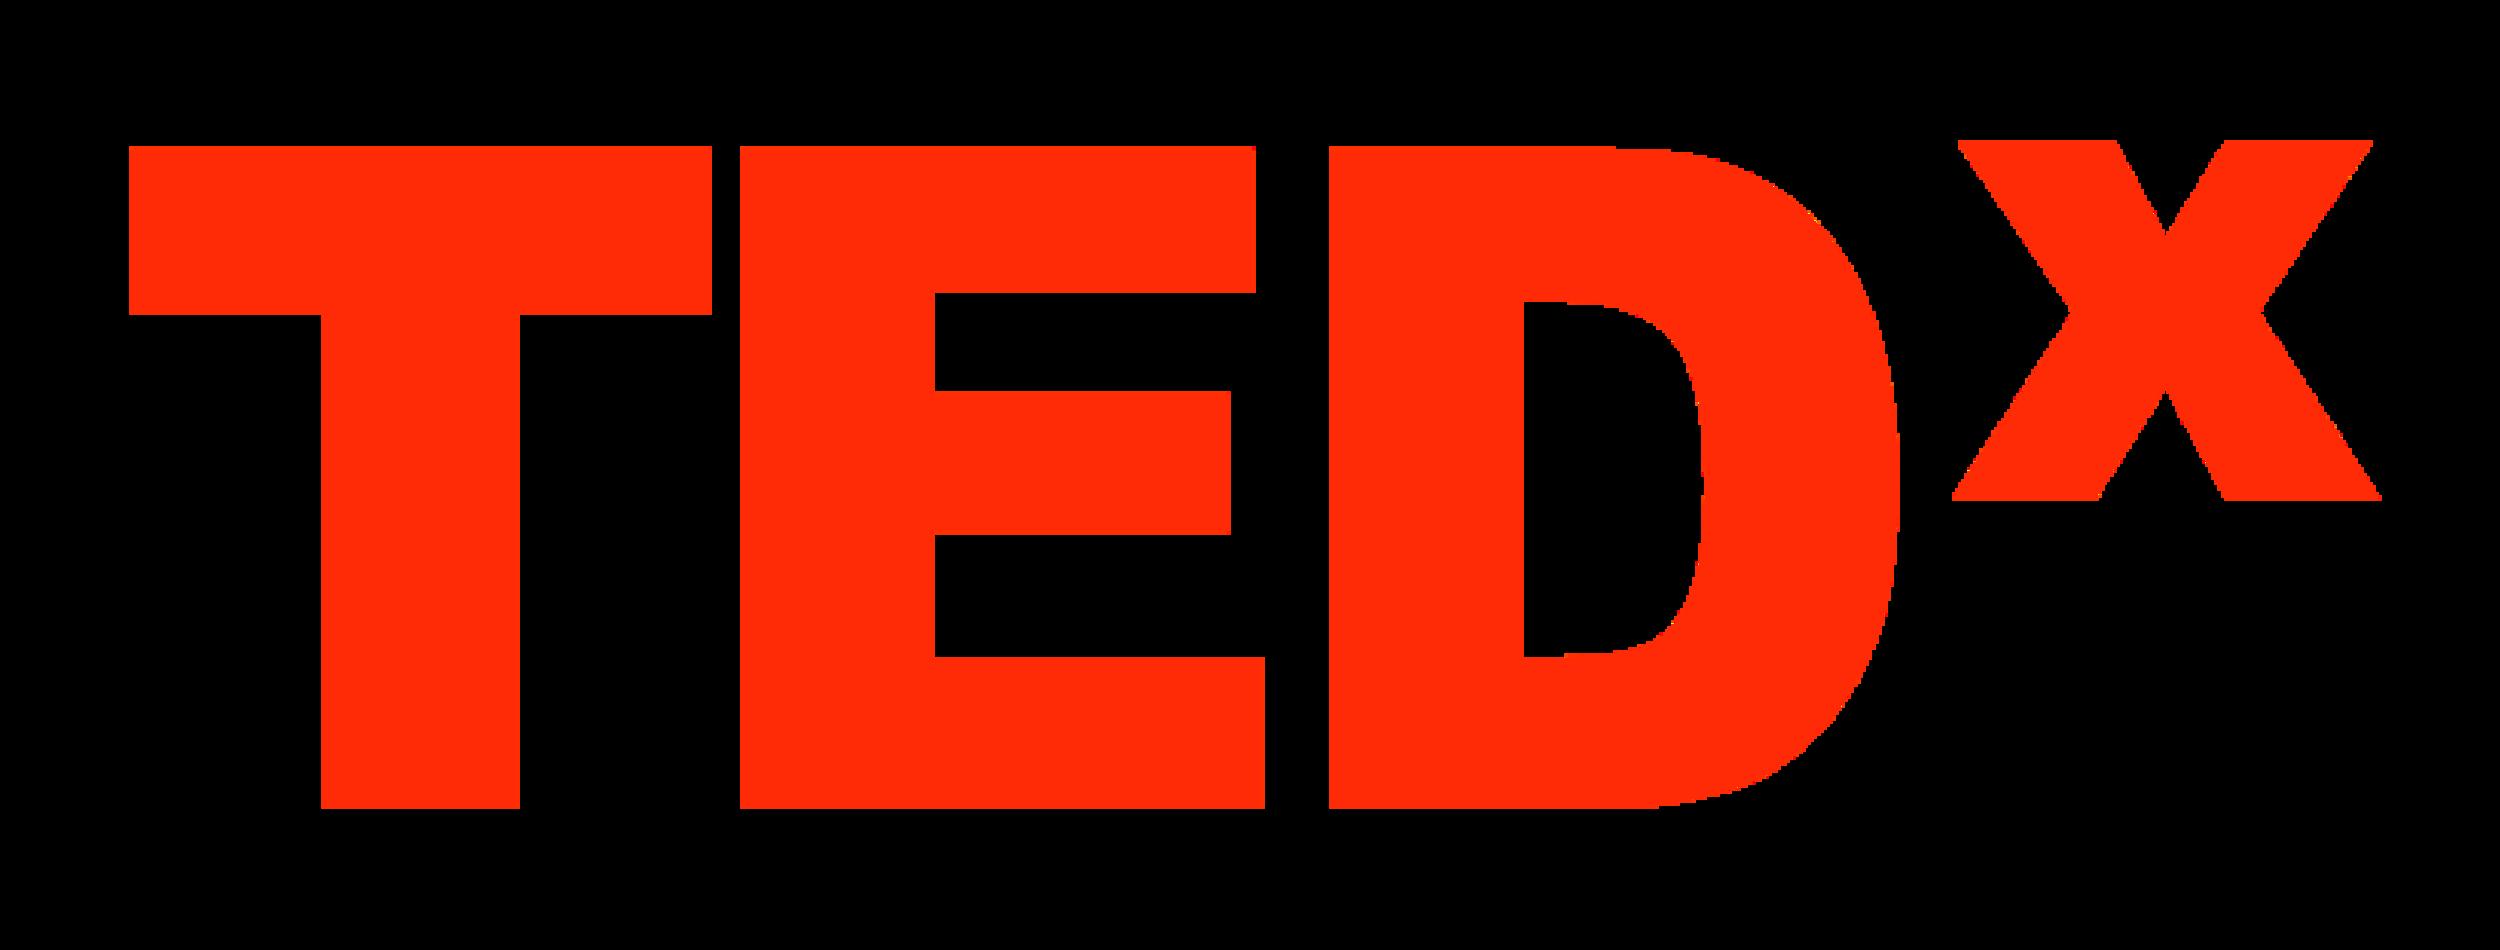 tedx-logo-01.png